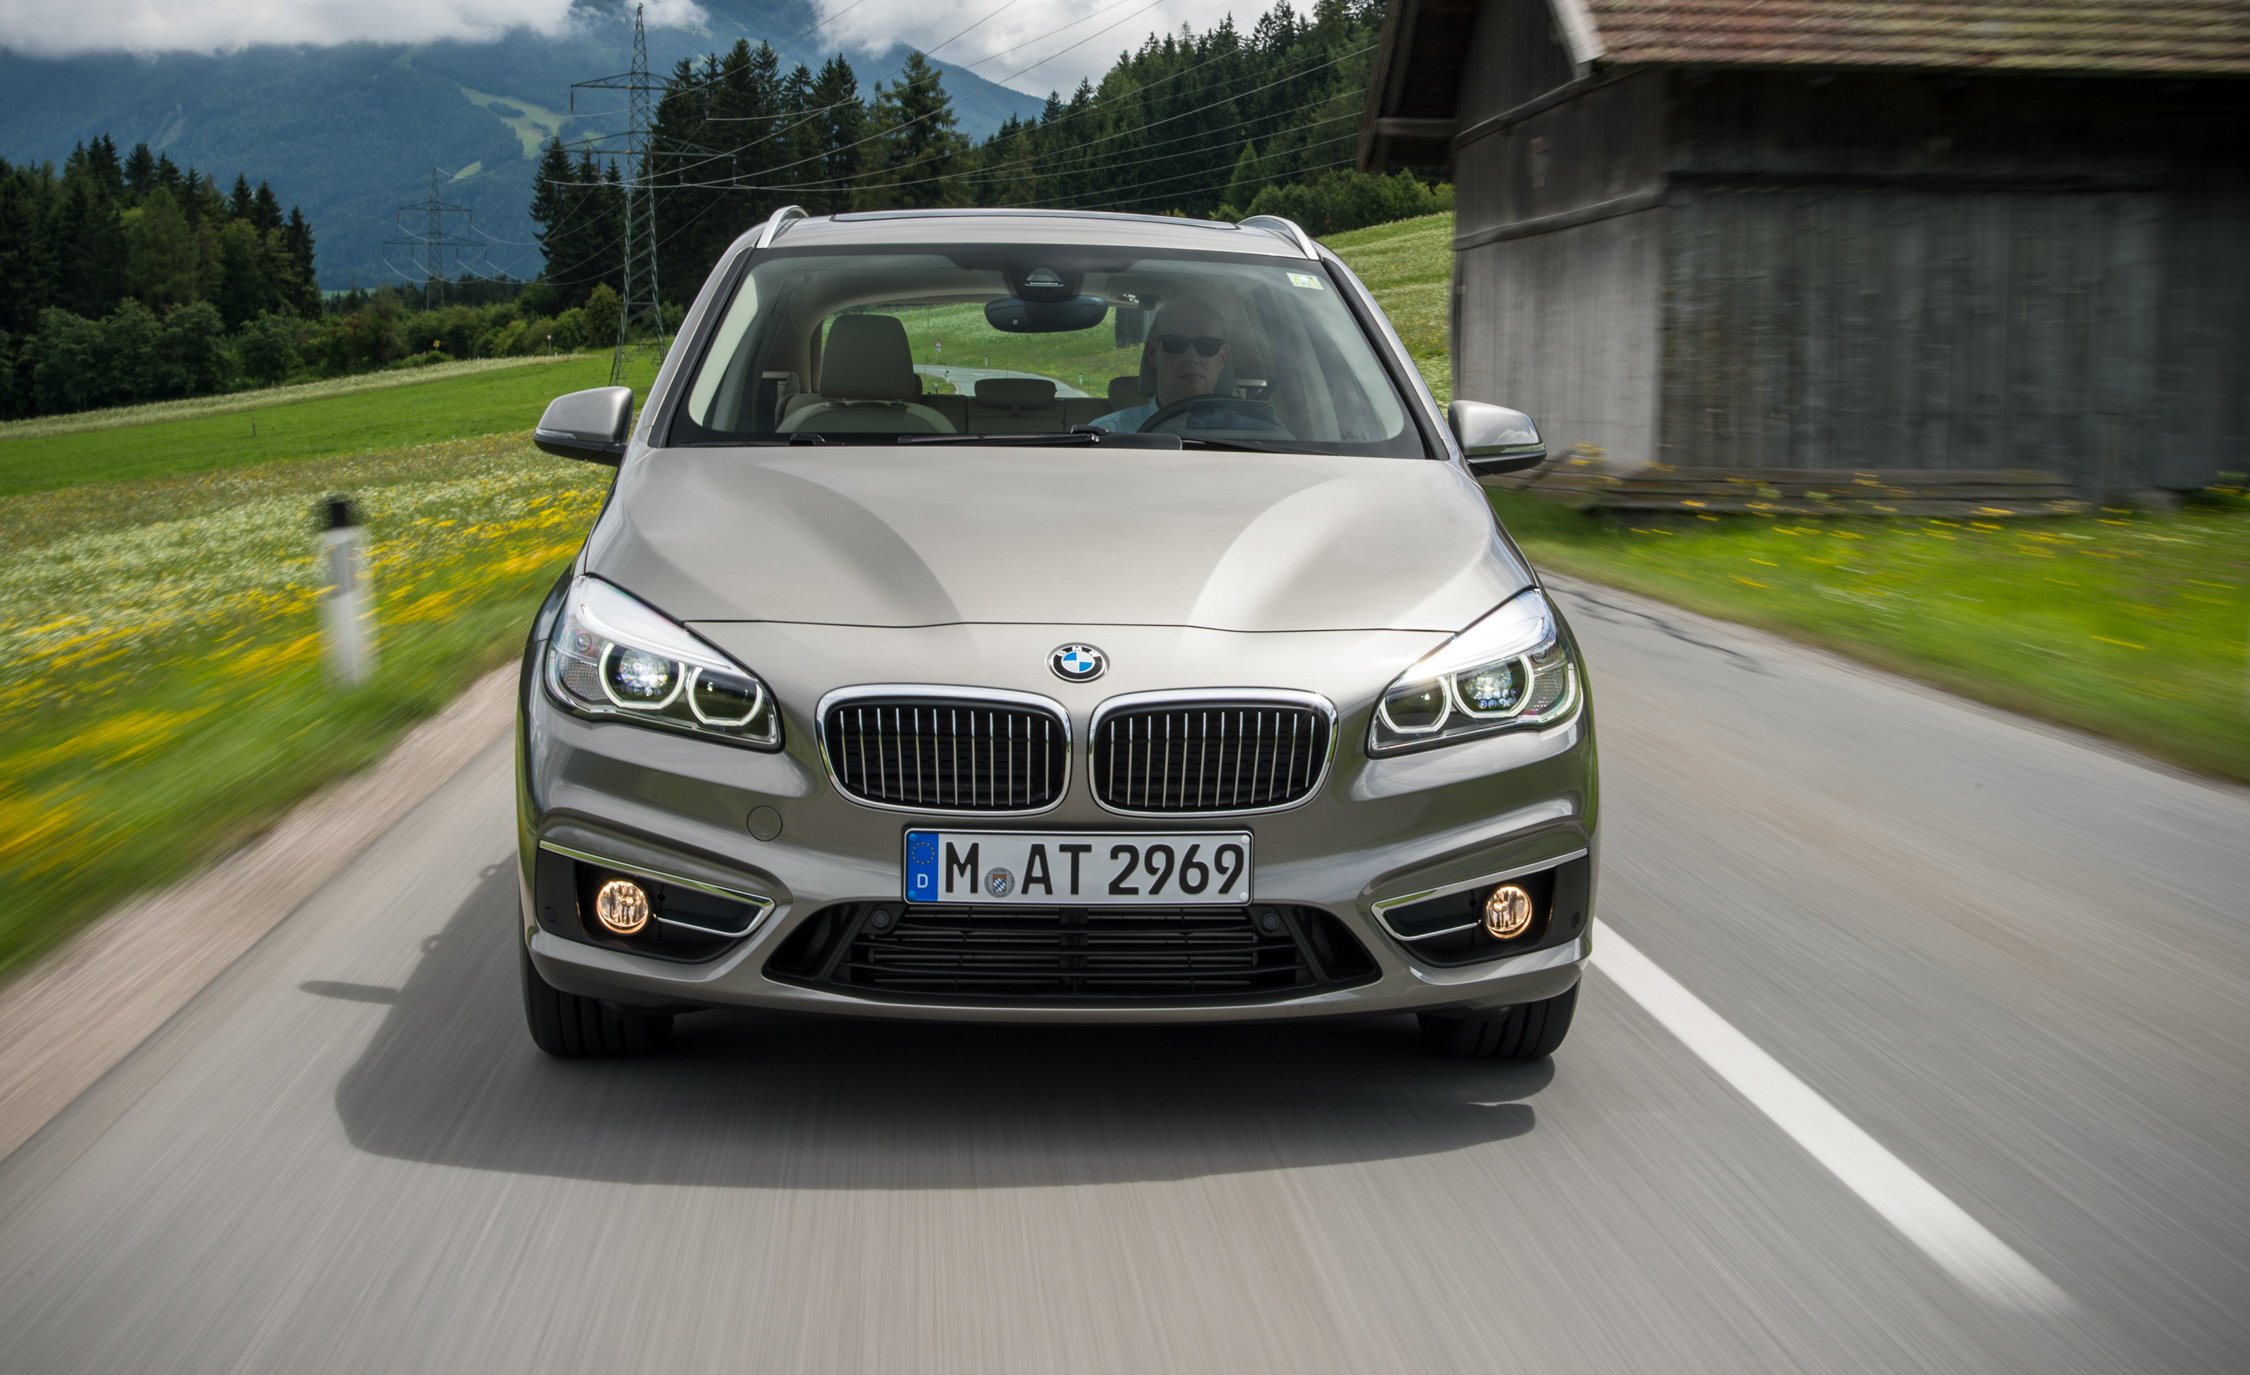 2015 BMW 225i Active Tourer Exterior Front